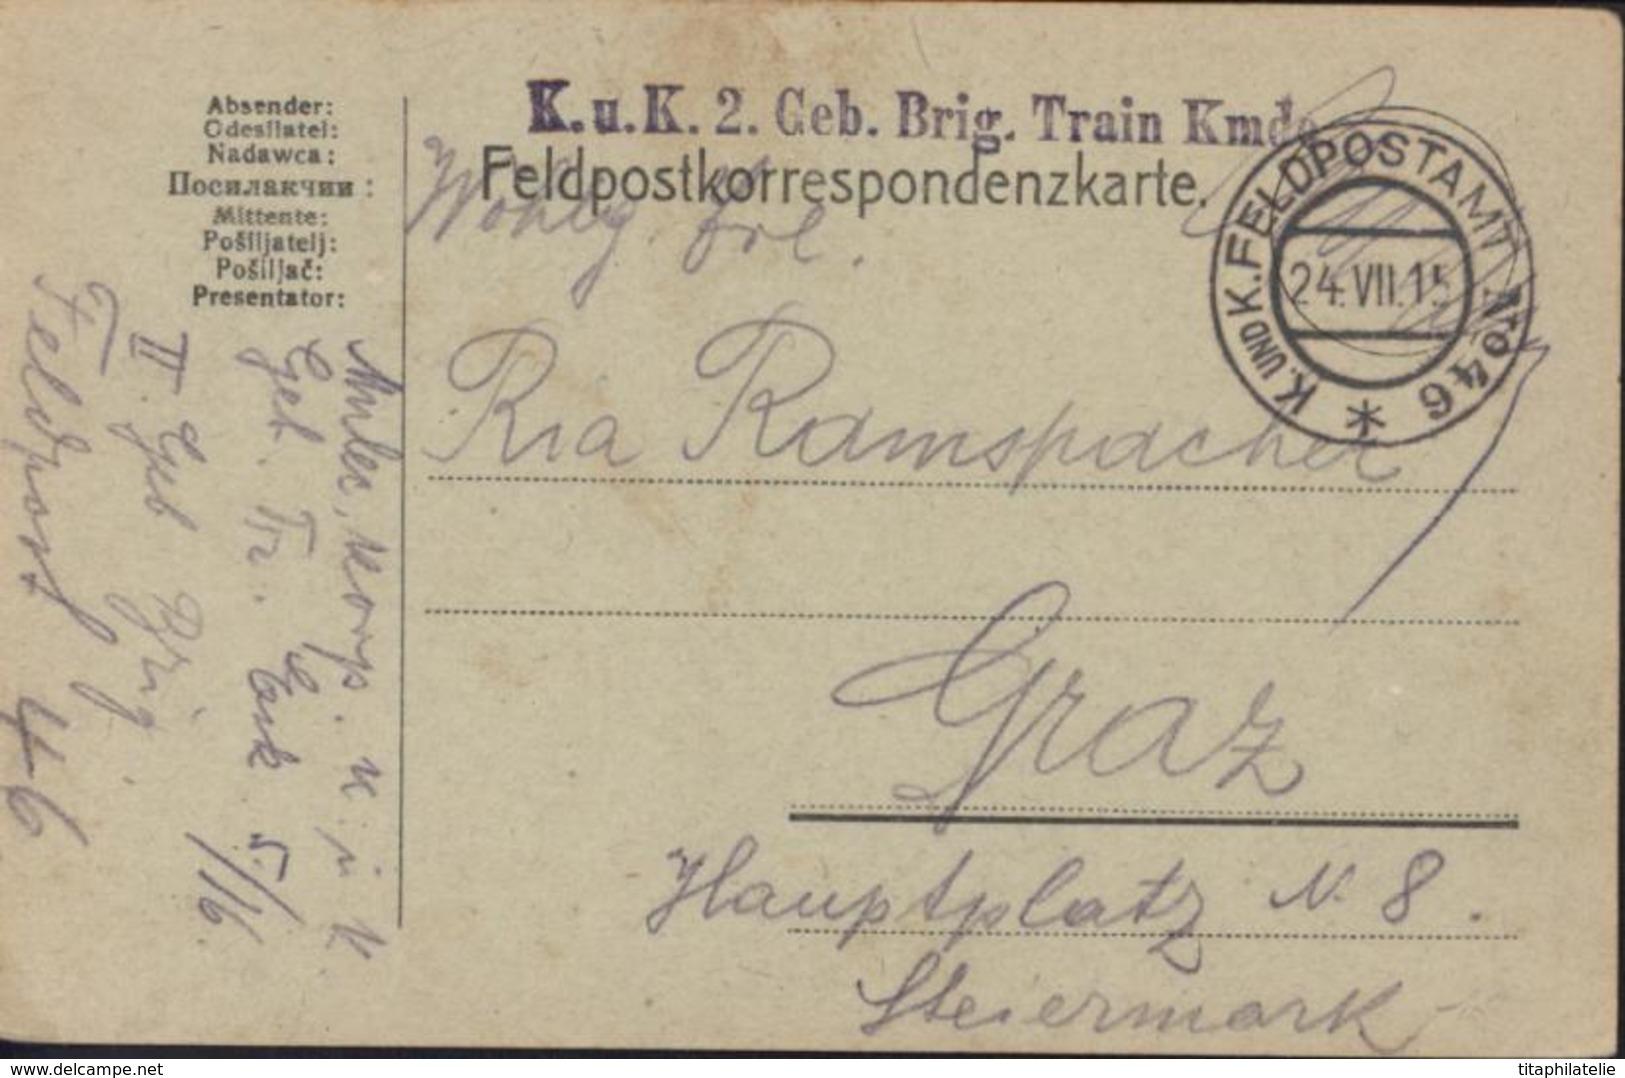 Guerre 14 Carte Correspondance Militaire FM K U K 2 Geb Brig Train Kmdo CAD KuK Feldpostamt N°46 24 VII 15 - Allemagne